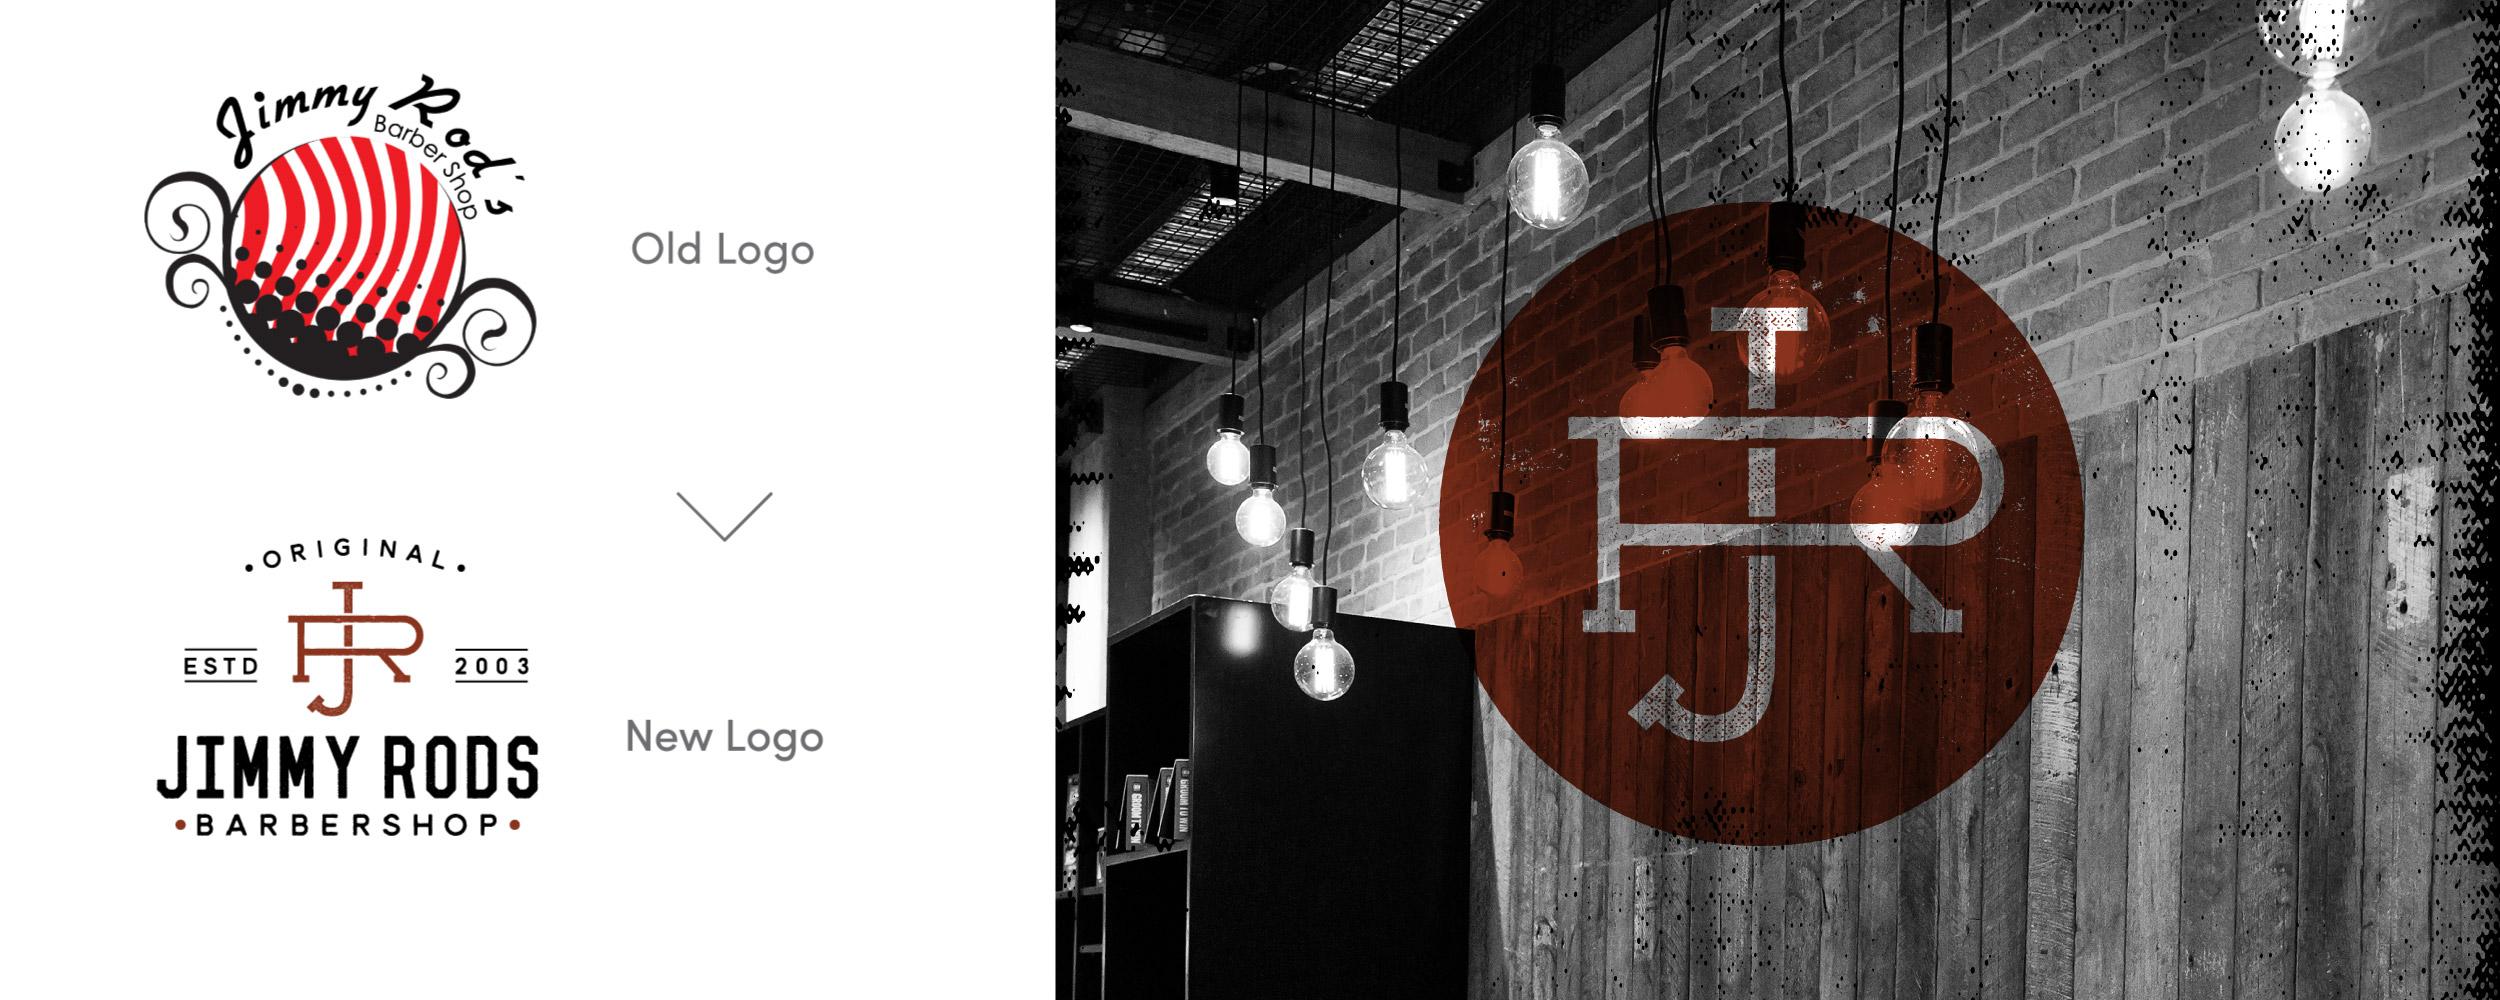 jimmyrodsbarbershop-logo-new.jpg